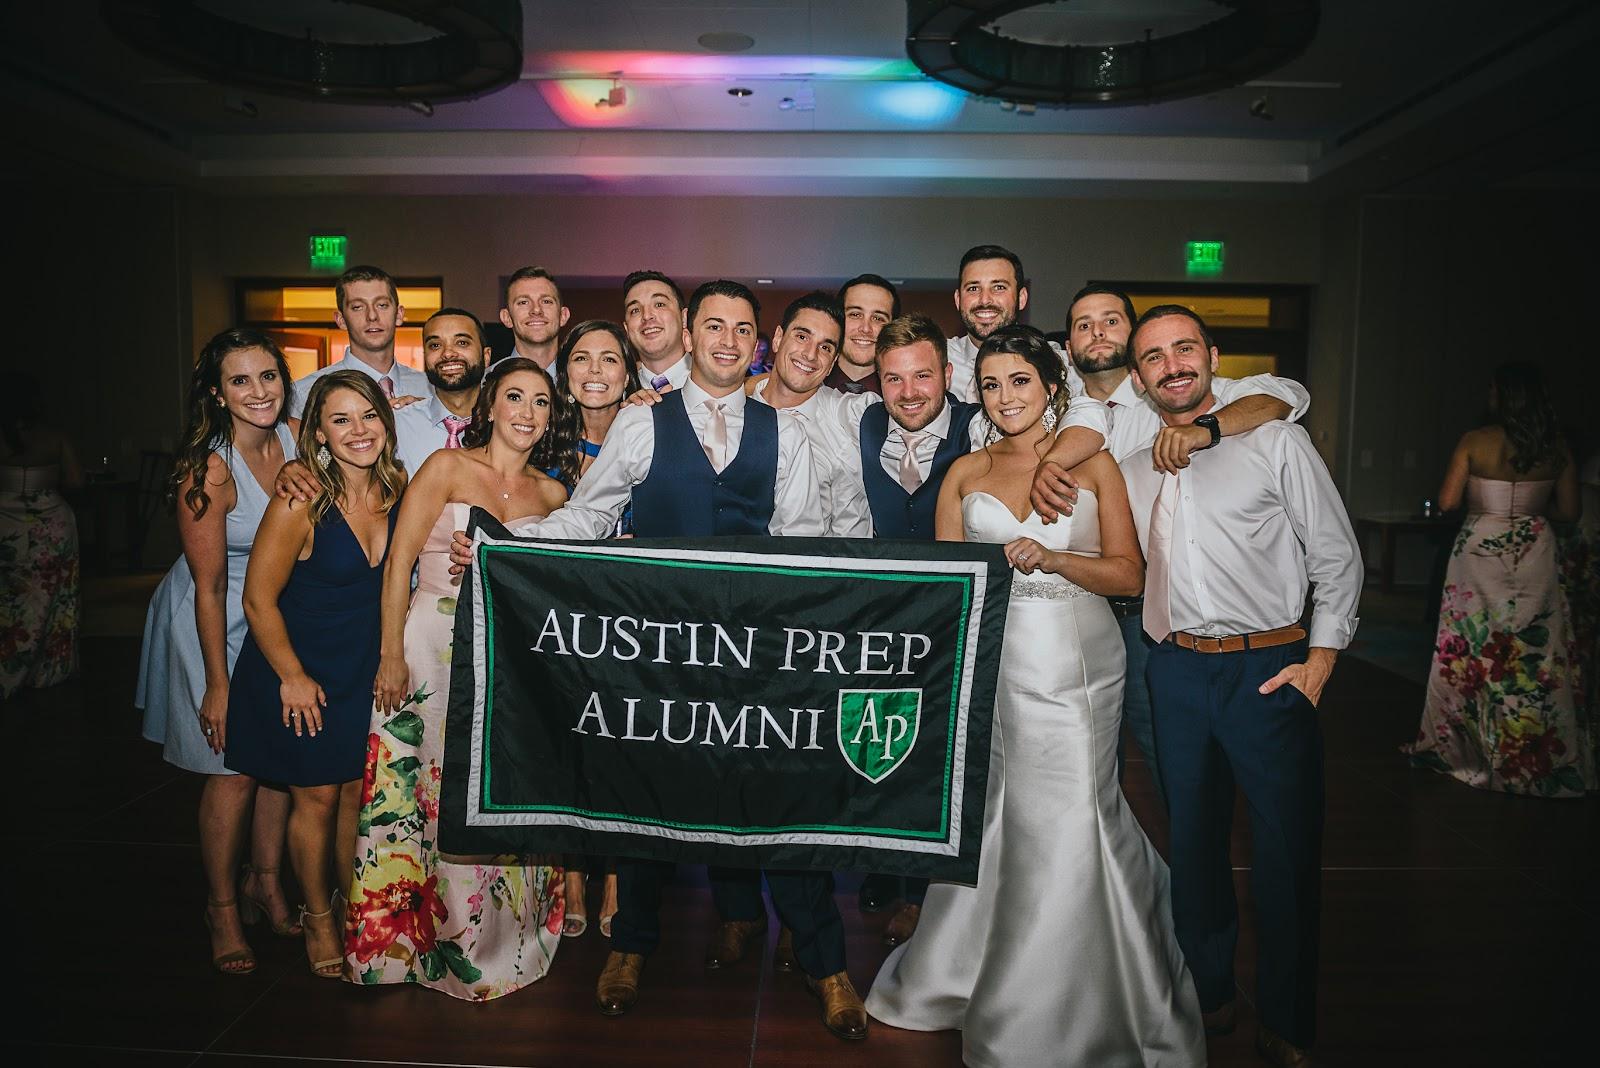 Austin Prep Alumni wedding